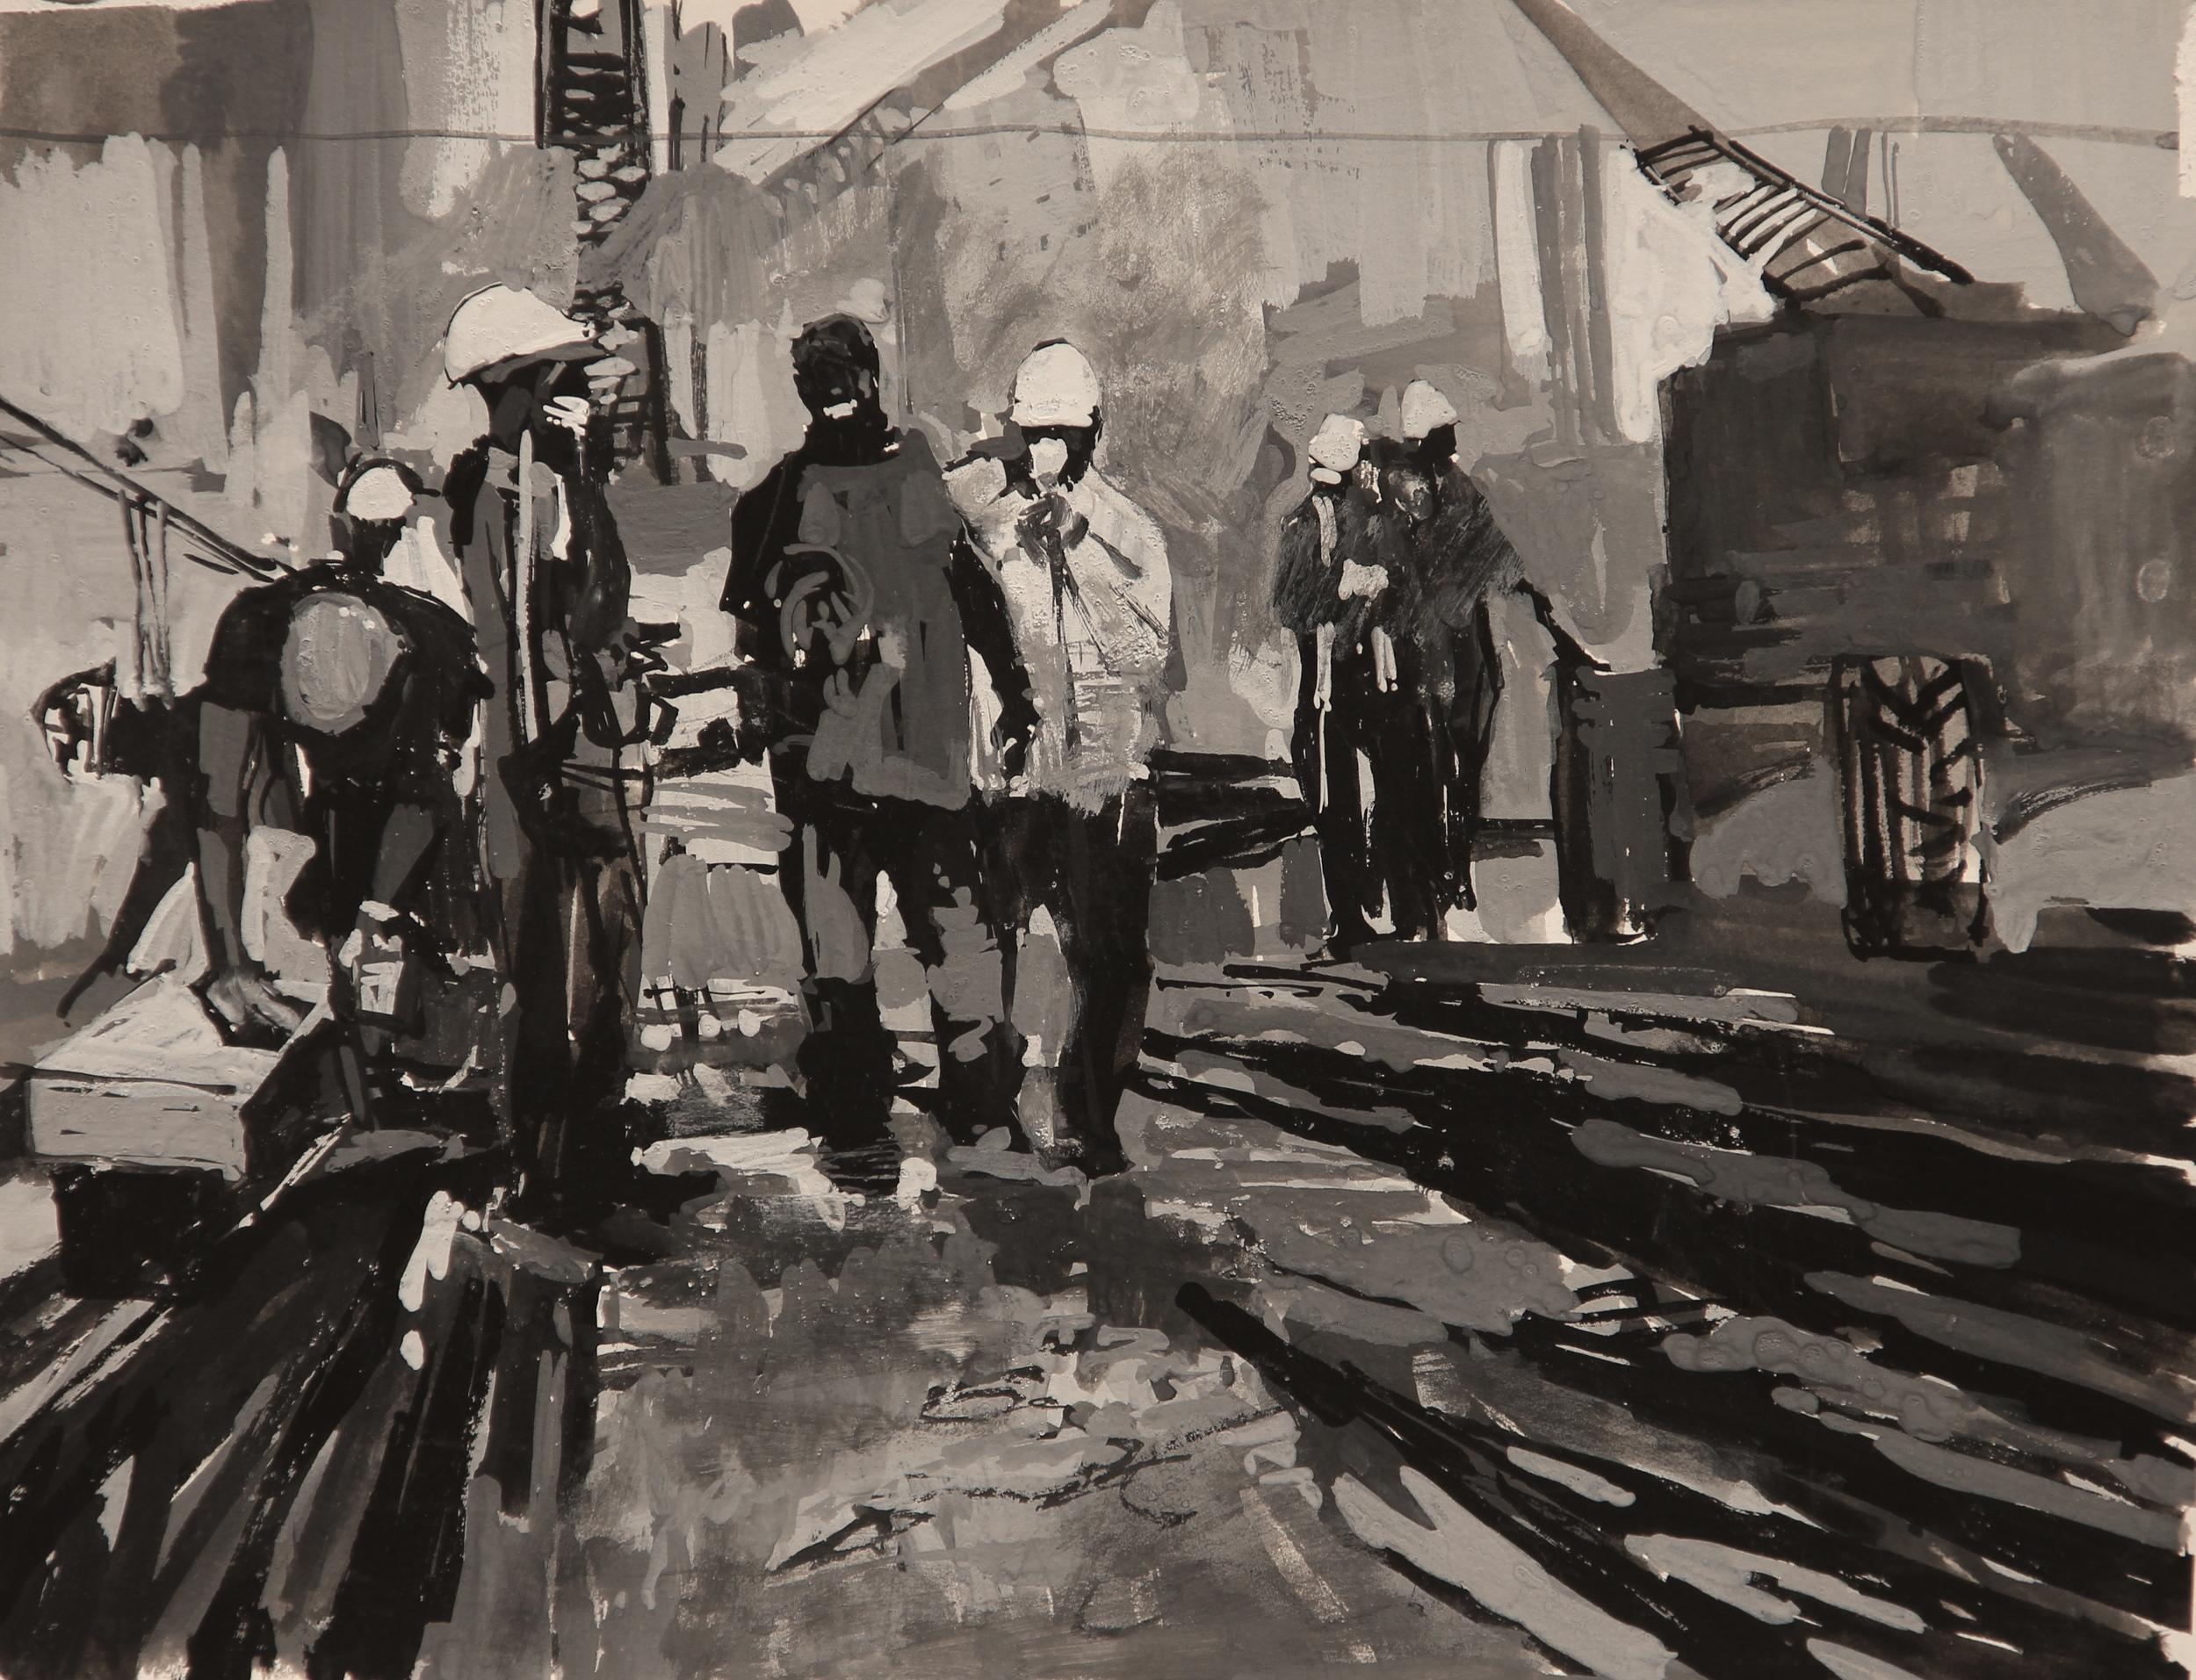 "Timur Akhriev Title: On the Break Study N2 Size:10"" x 12.5"" Gouache on Watercolor Paper. 2009. Unframed. Sold"